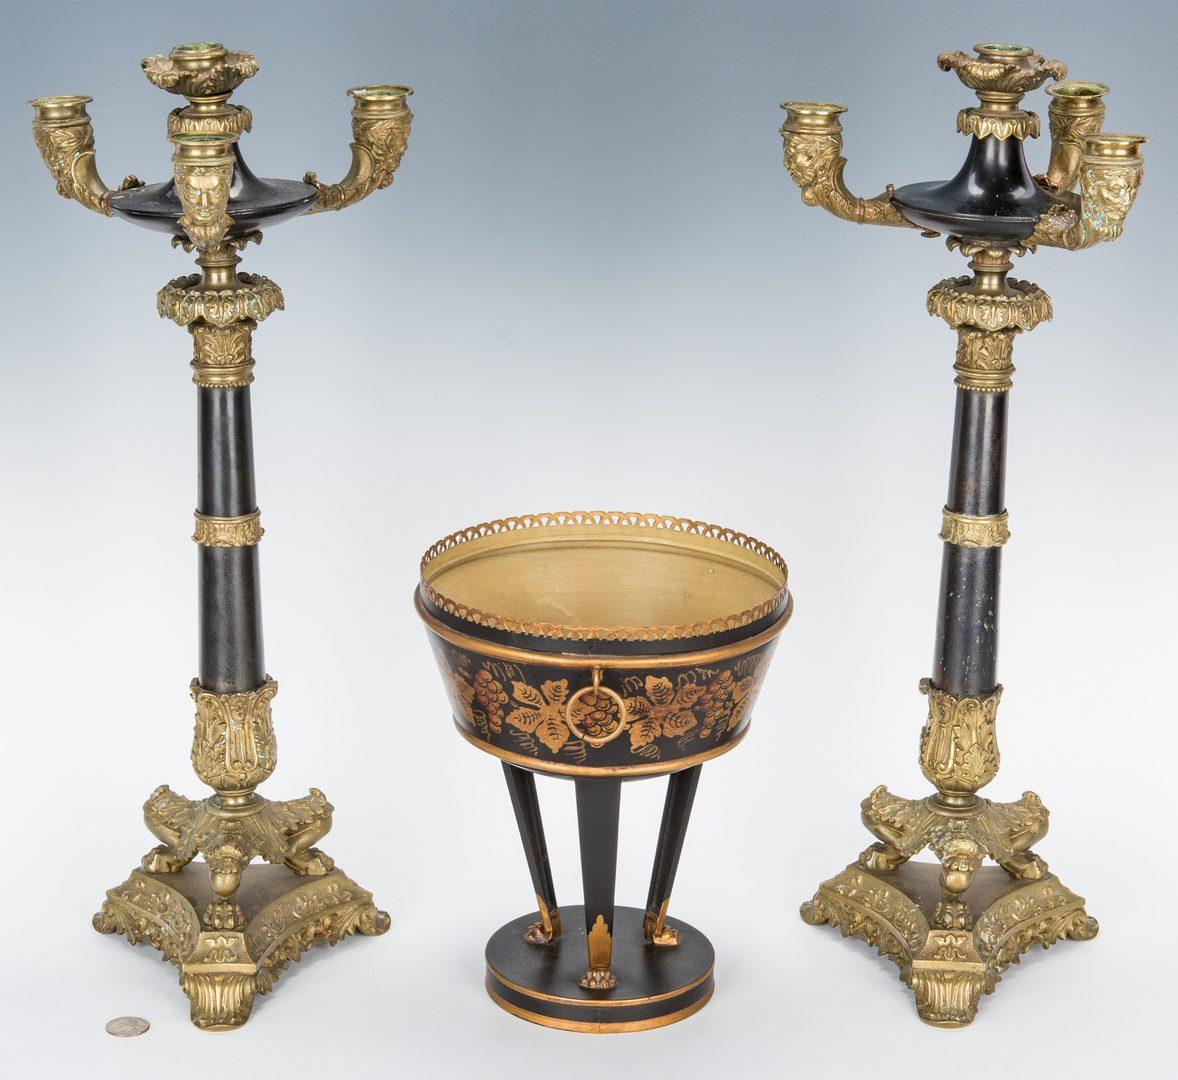 Lot 624: Pr. of Gilt Bronze Candelabra & Tole Centerpiece Basket